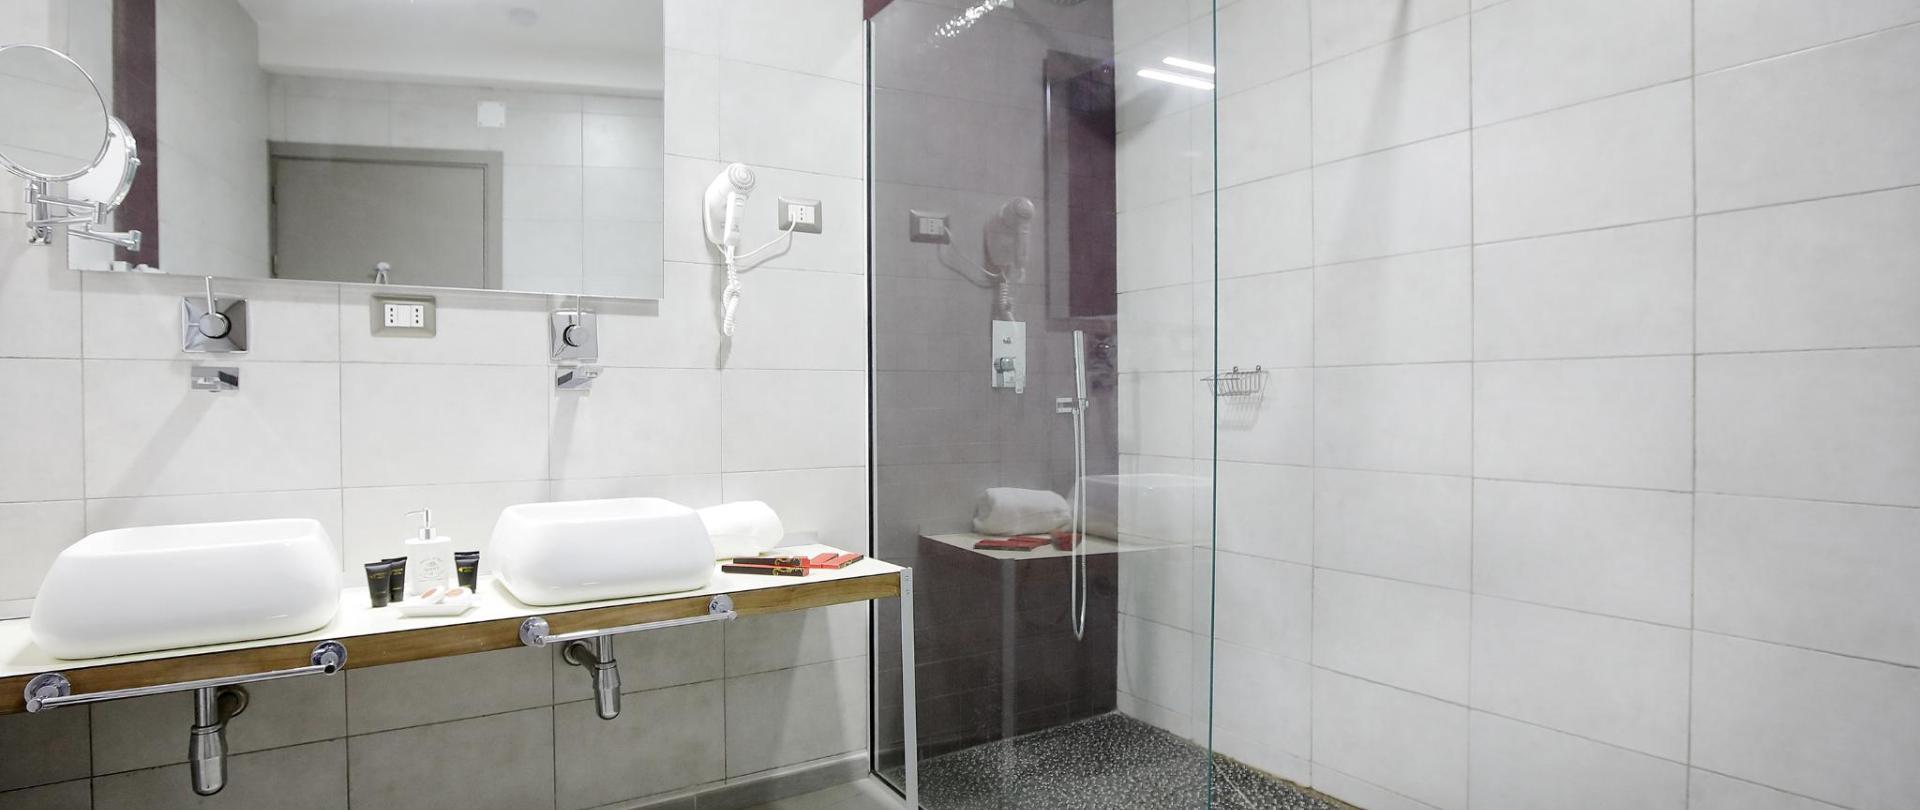 0081_Hotel La Villette Isoraka_17-10-13.jpg